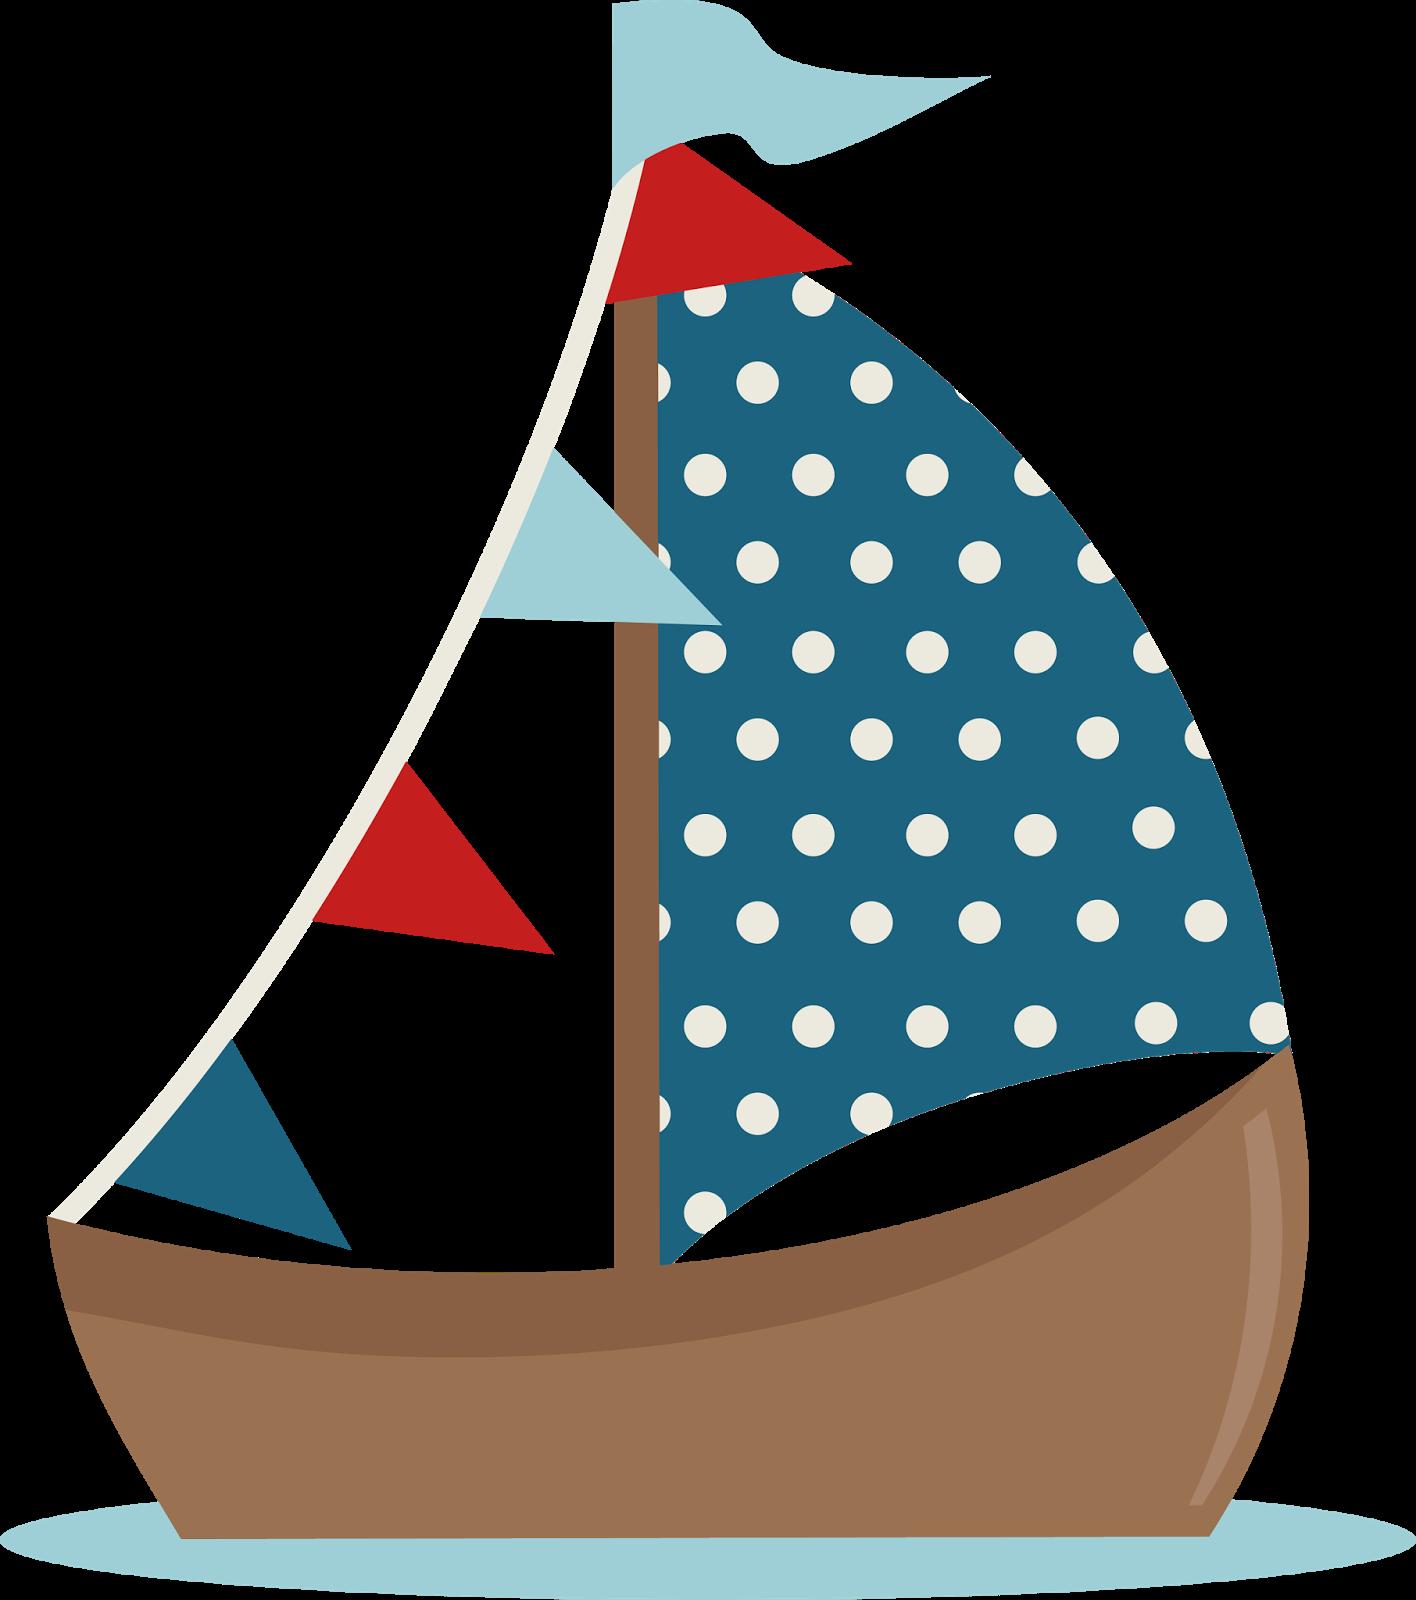 Sailing Boat clipart cute #7